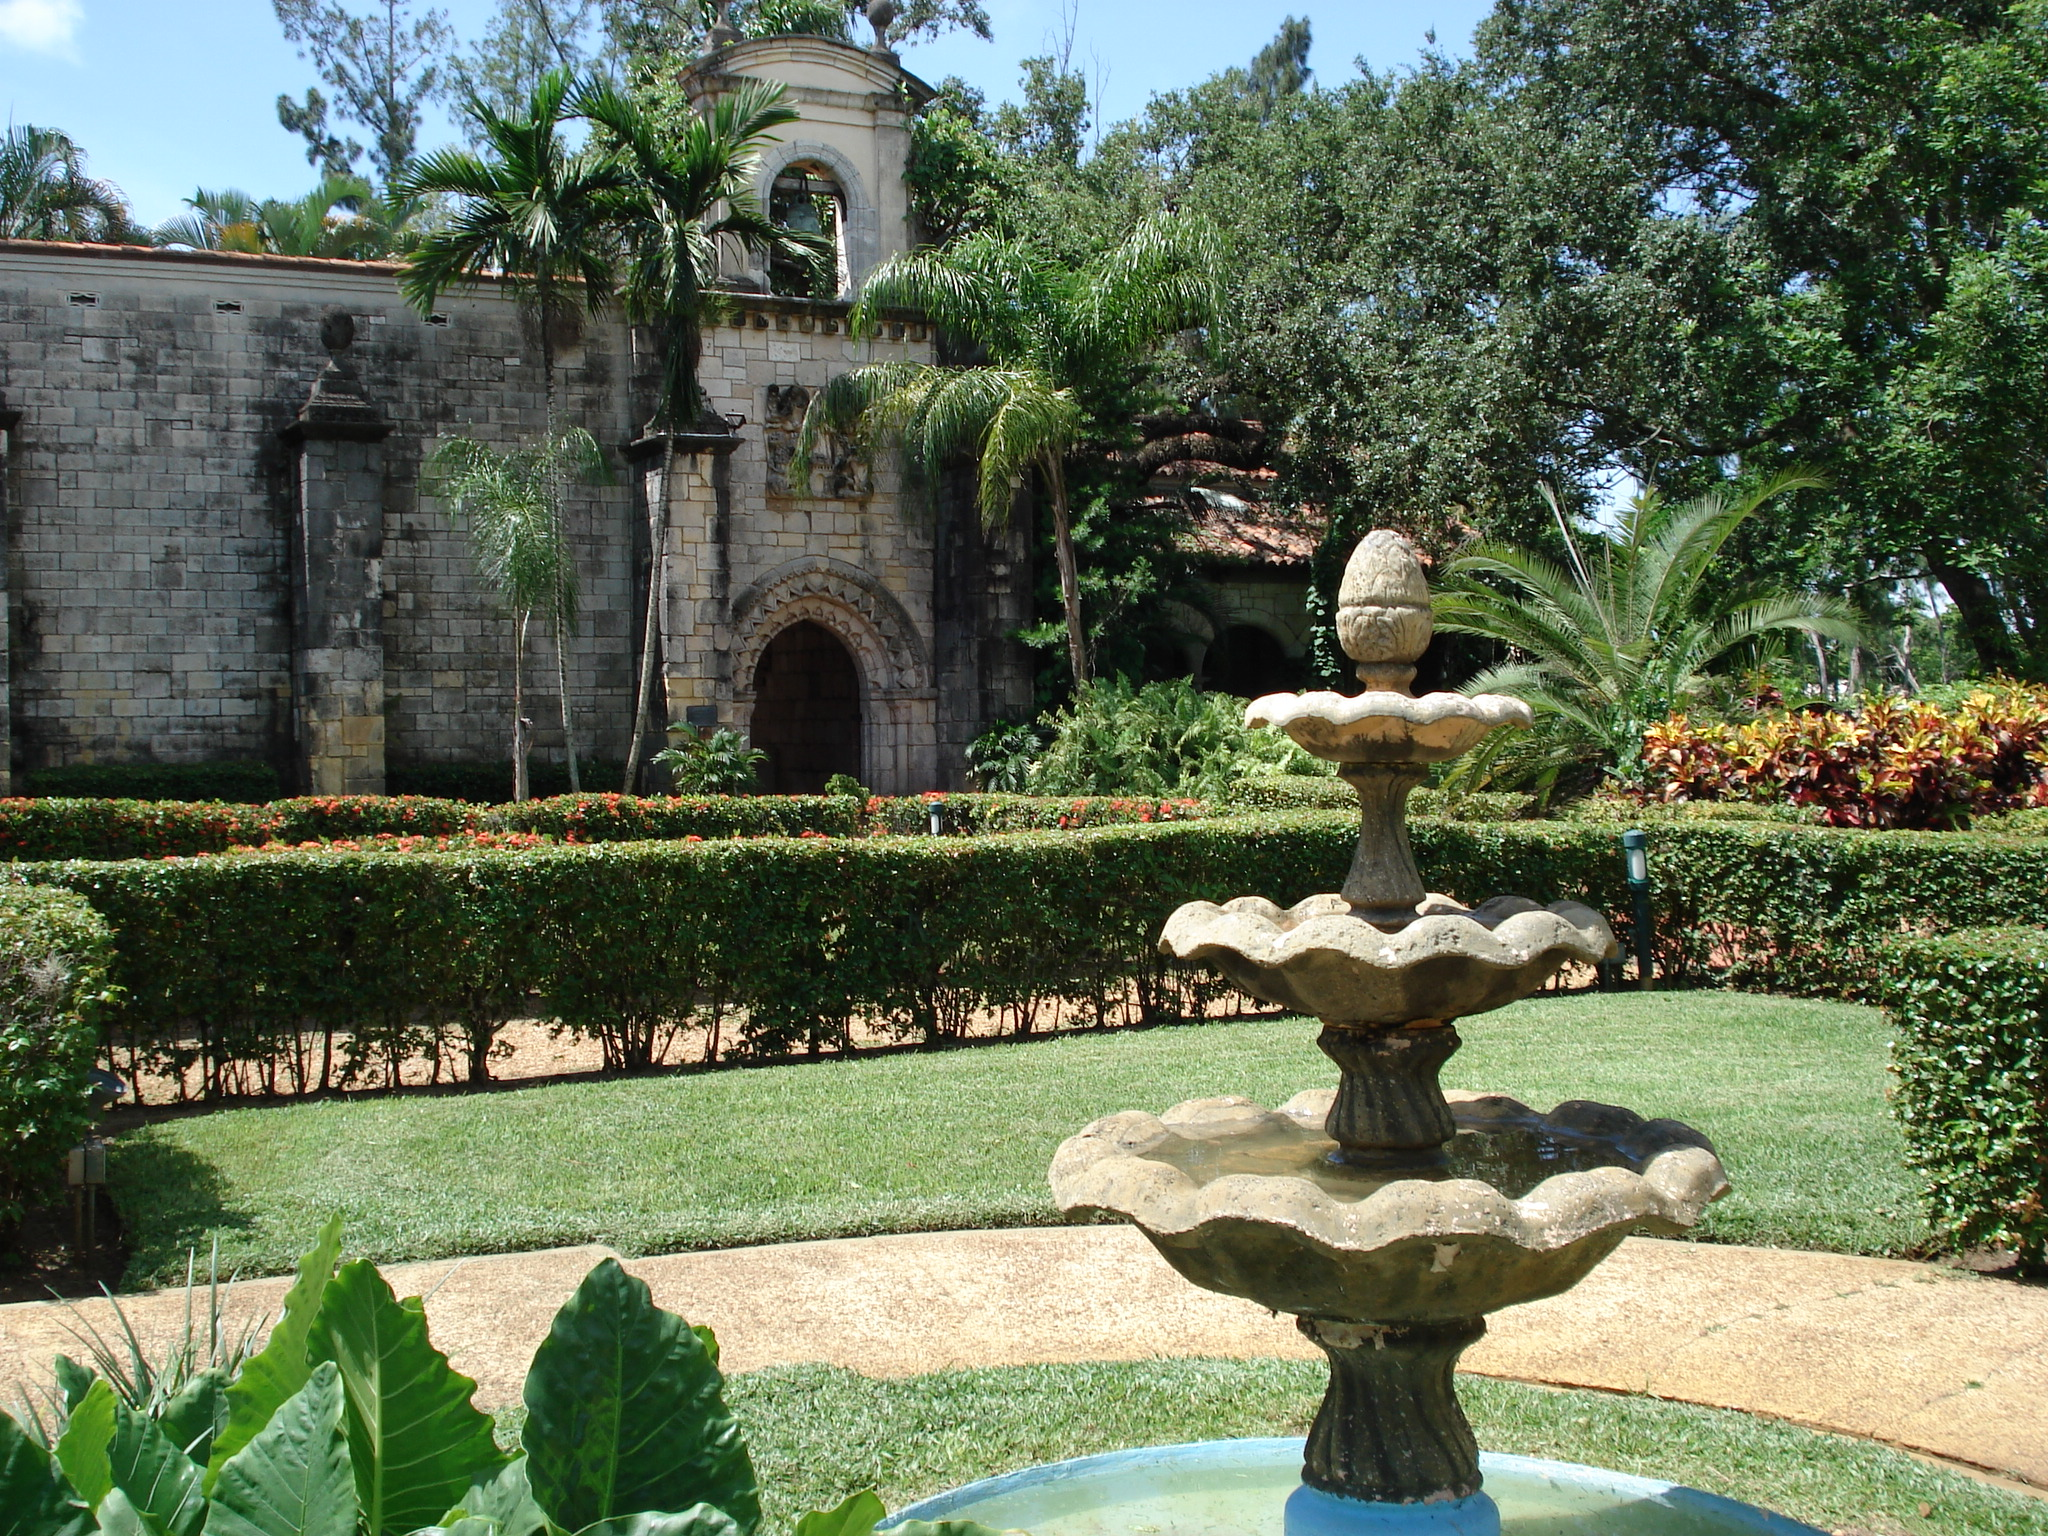 Ancient_Spanish_Monastery_of_St_Bernard_De_Clairvaux_Cloisters.jpg